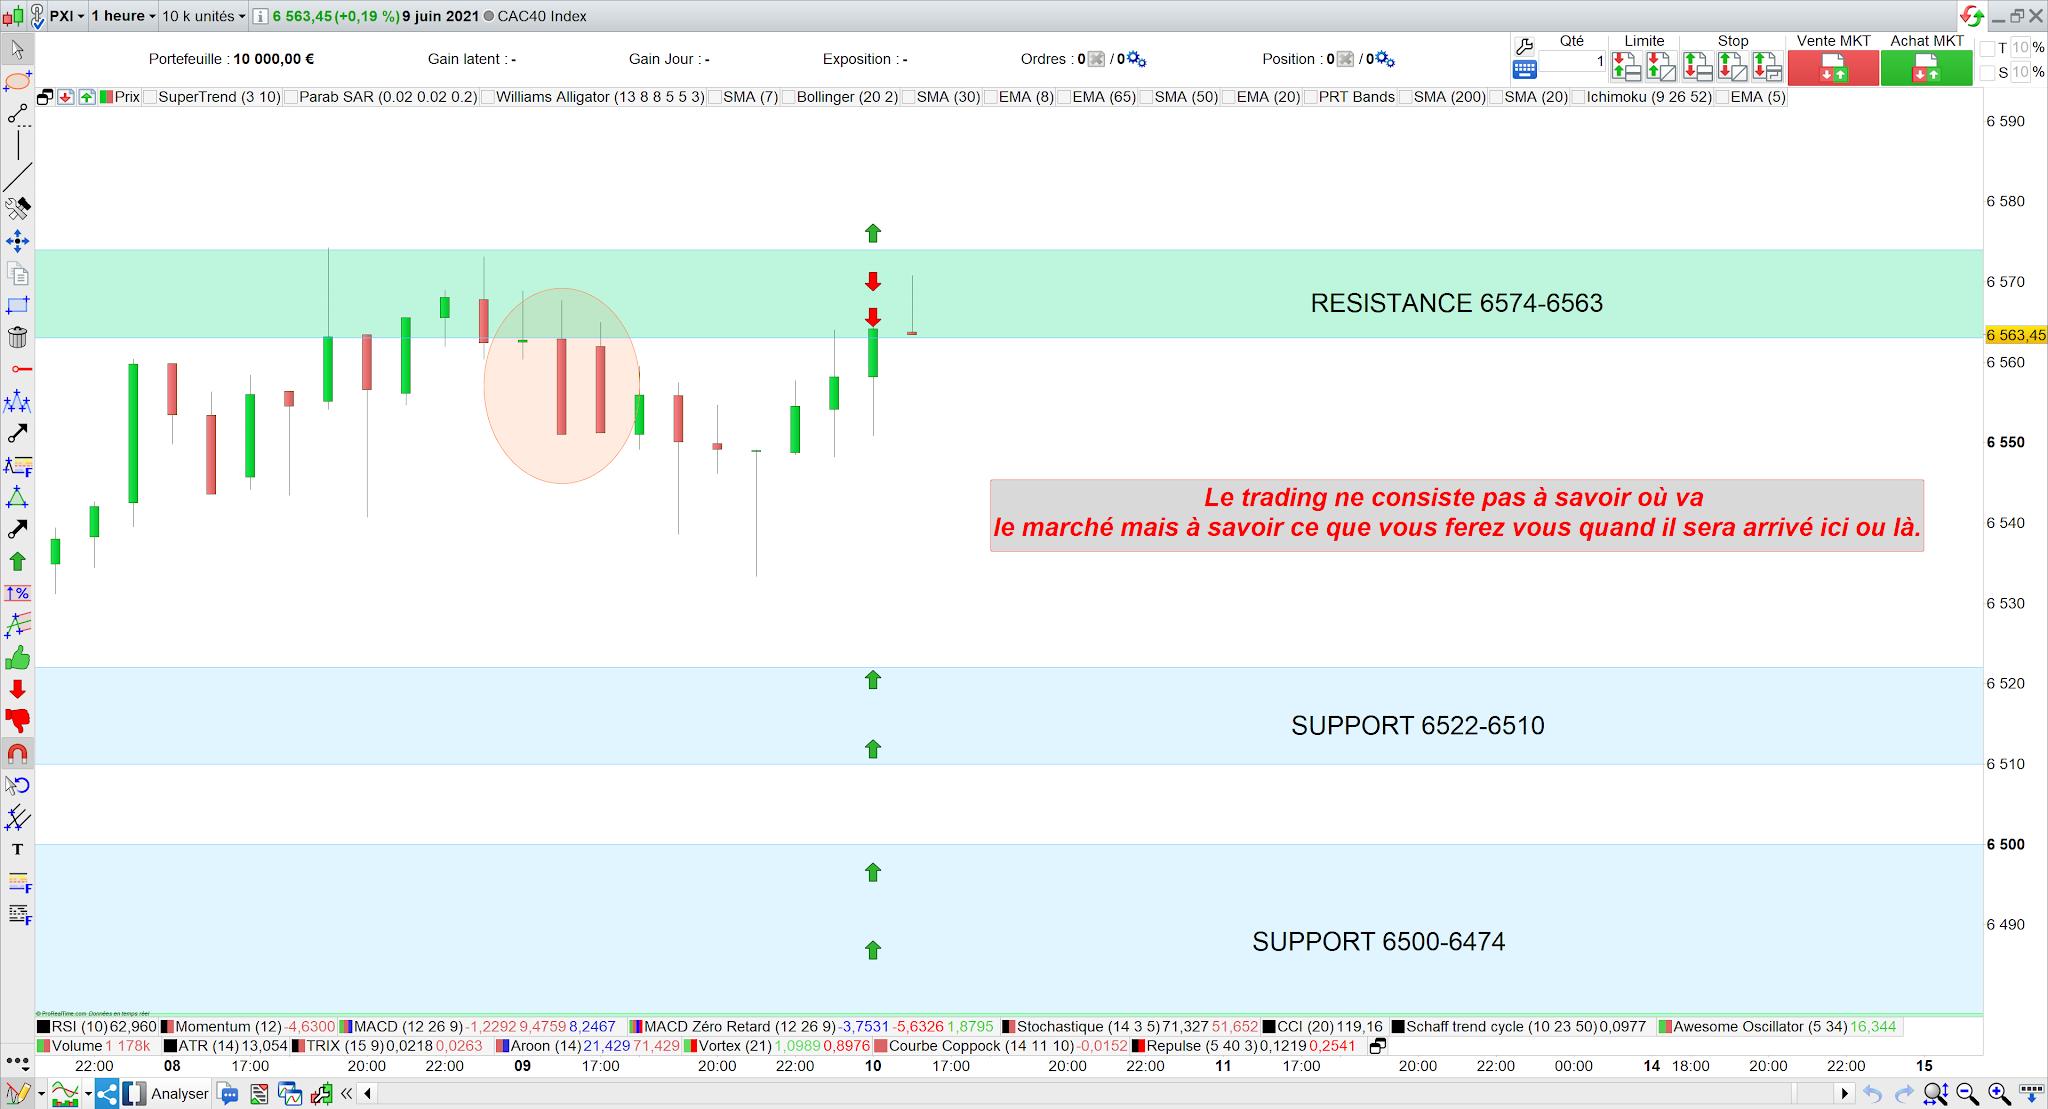 Bilan trading cac40 09 juin 21